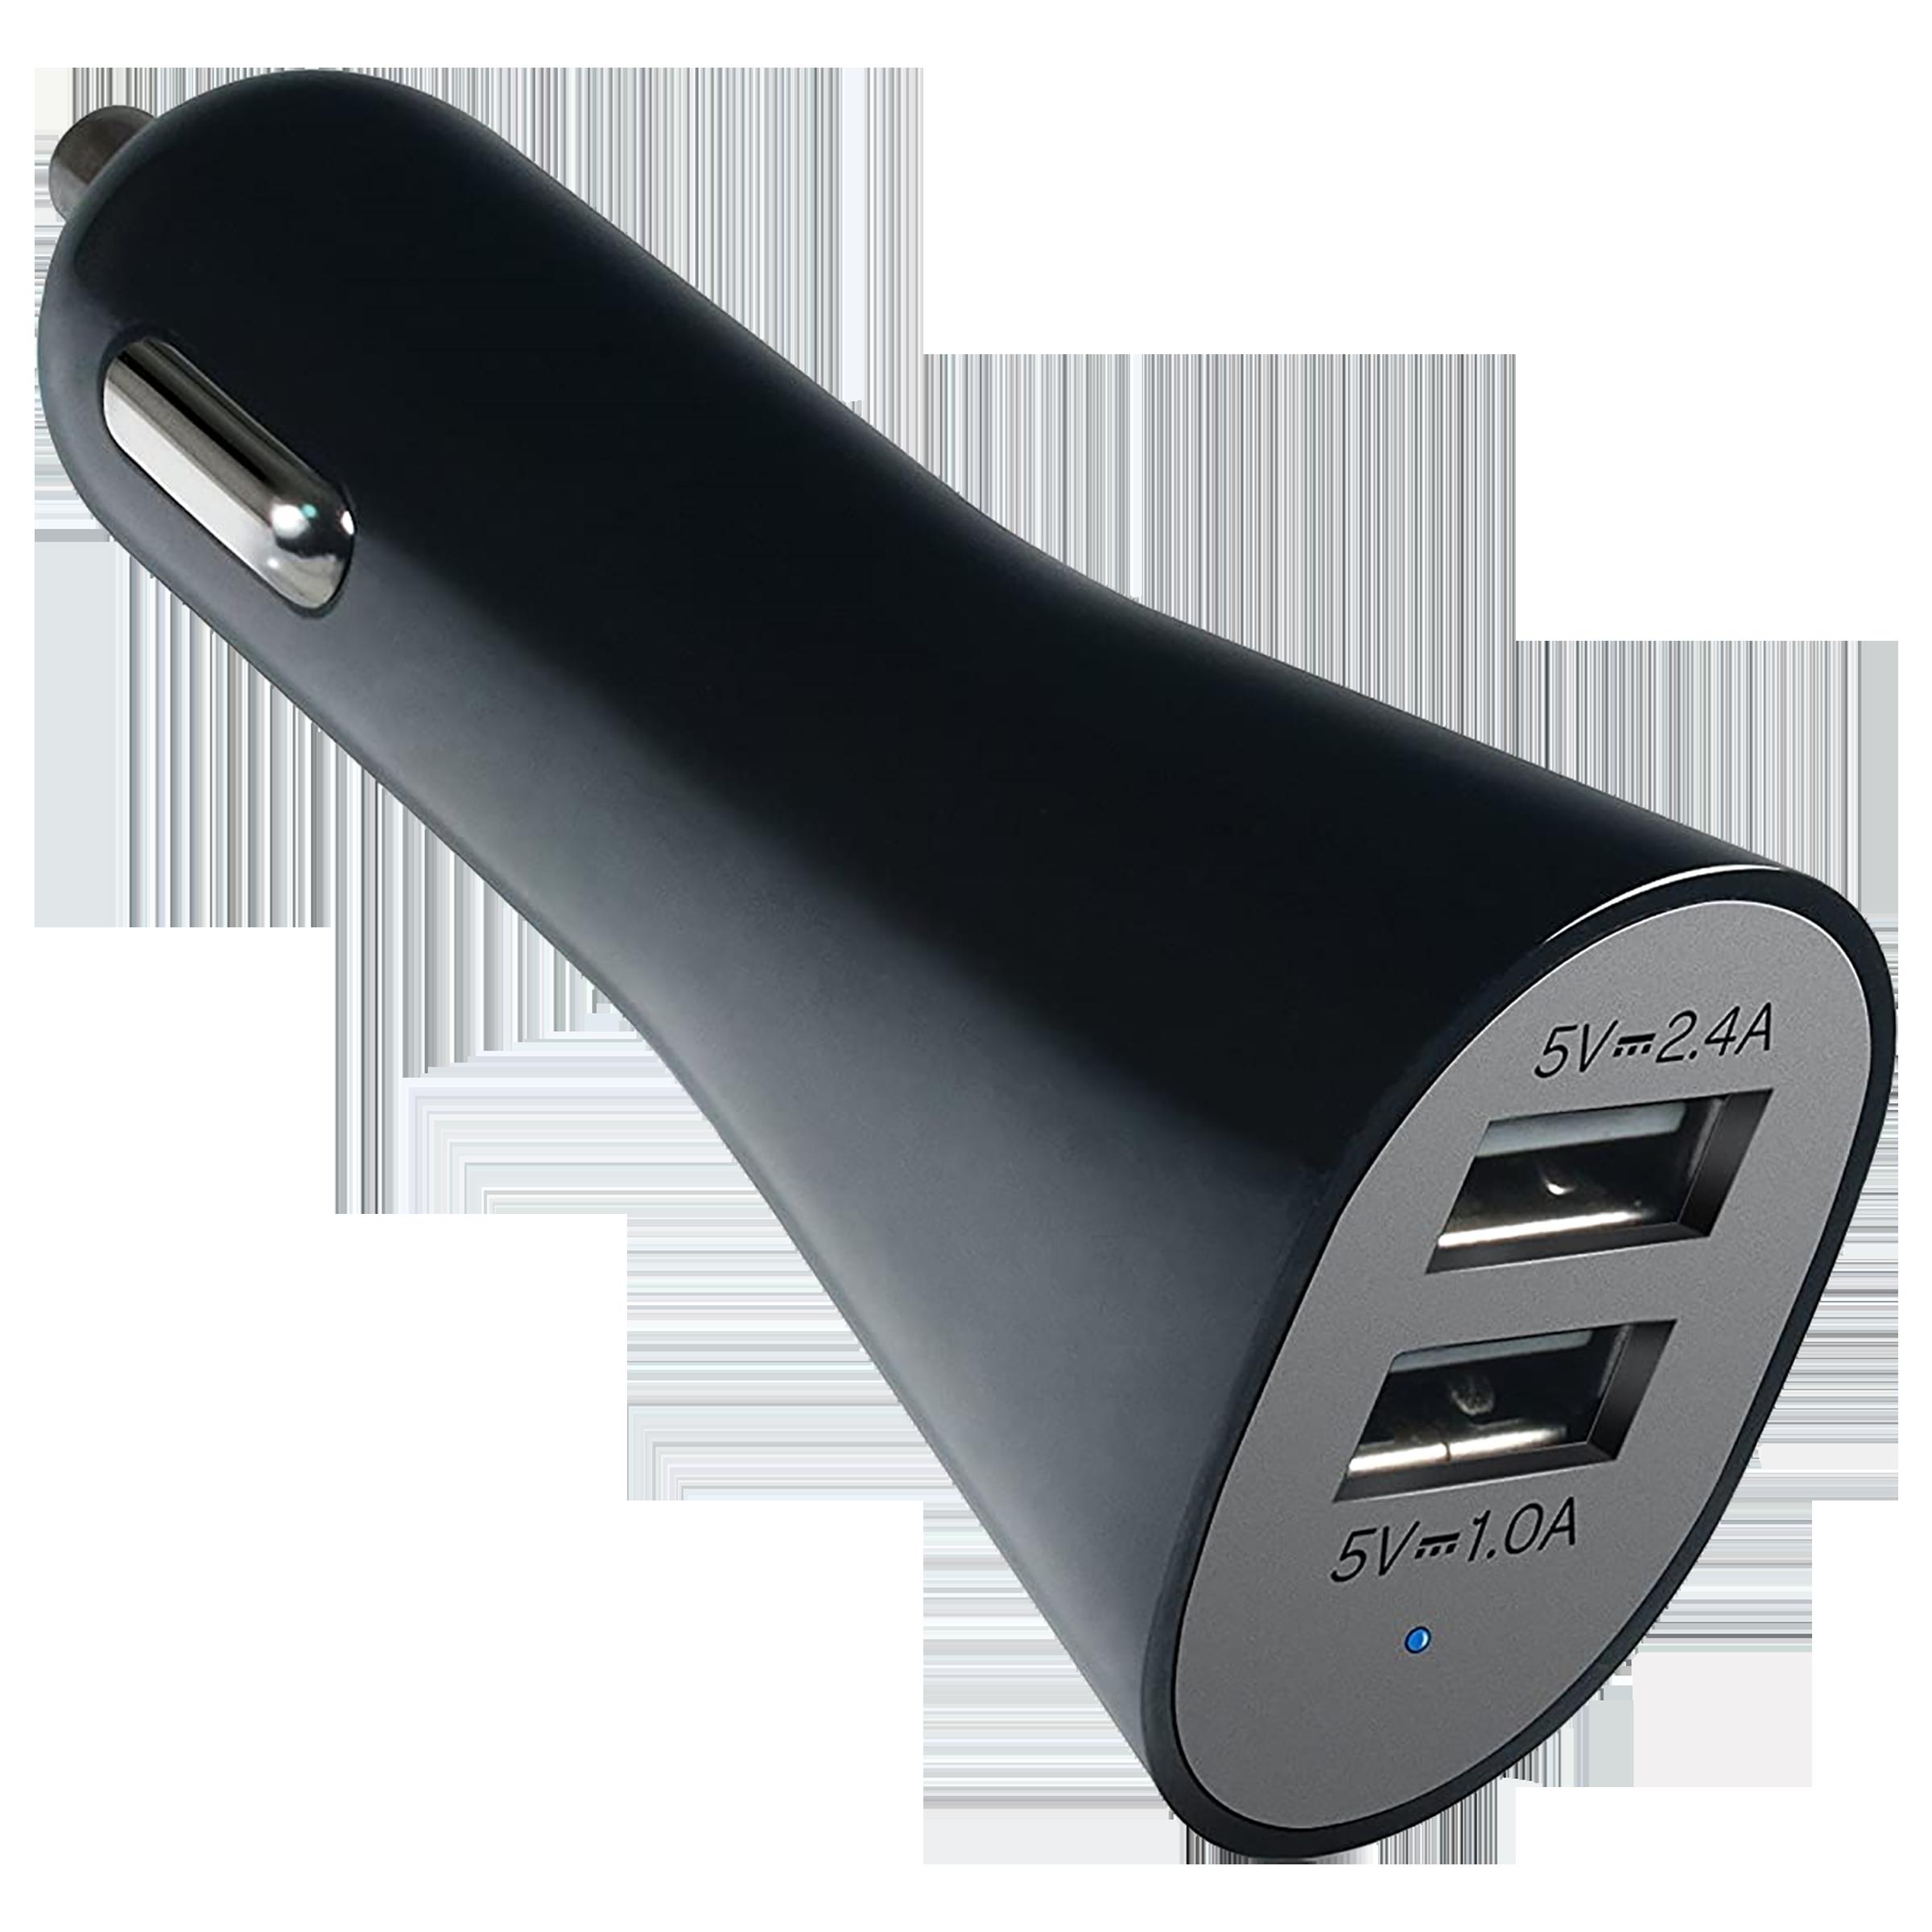 AT&T 2 USB Ports Car Charging Adapter (Led Indicator, CC34-blk, Black)